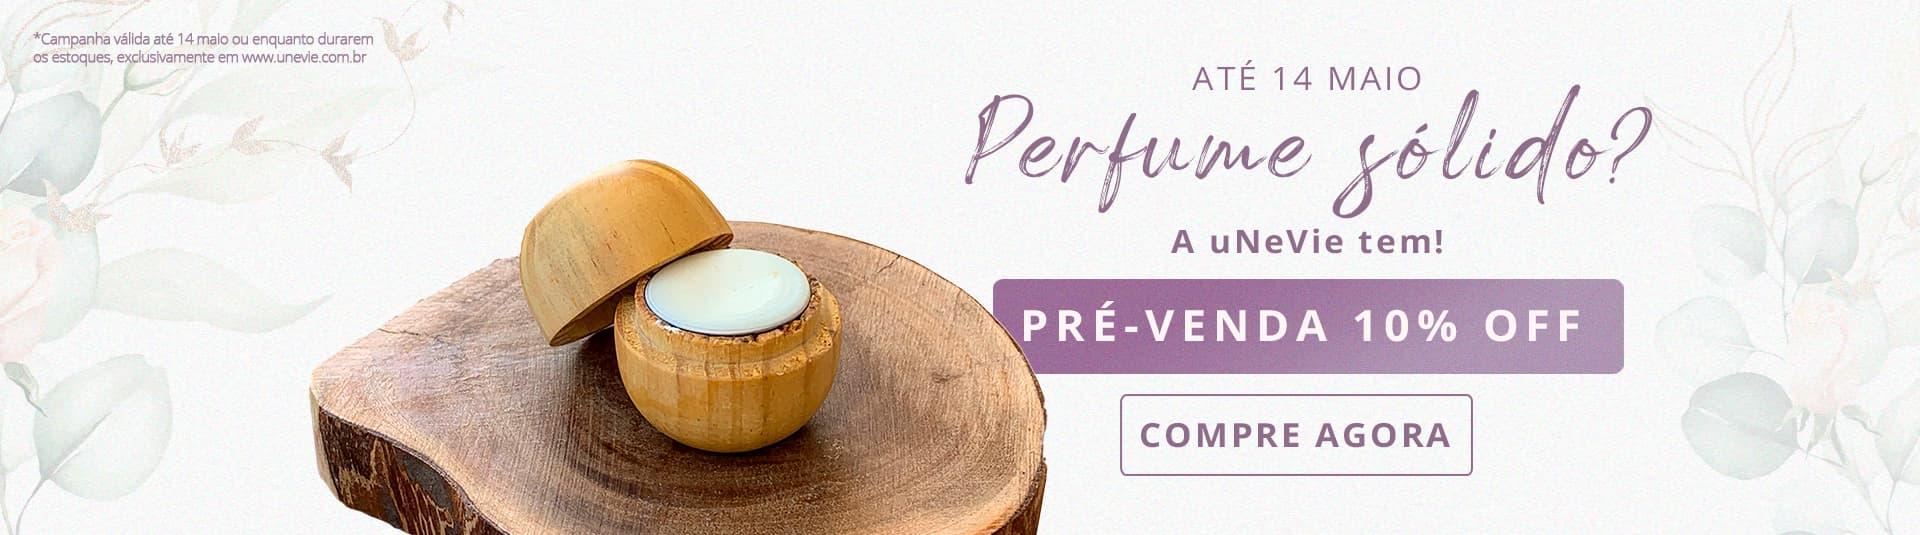 LR 2021-05-03 pre-venda perfumes